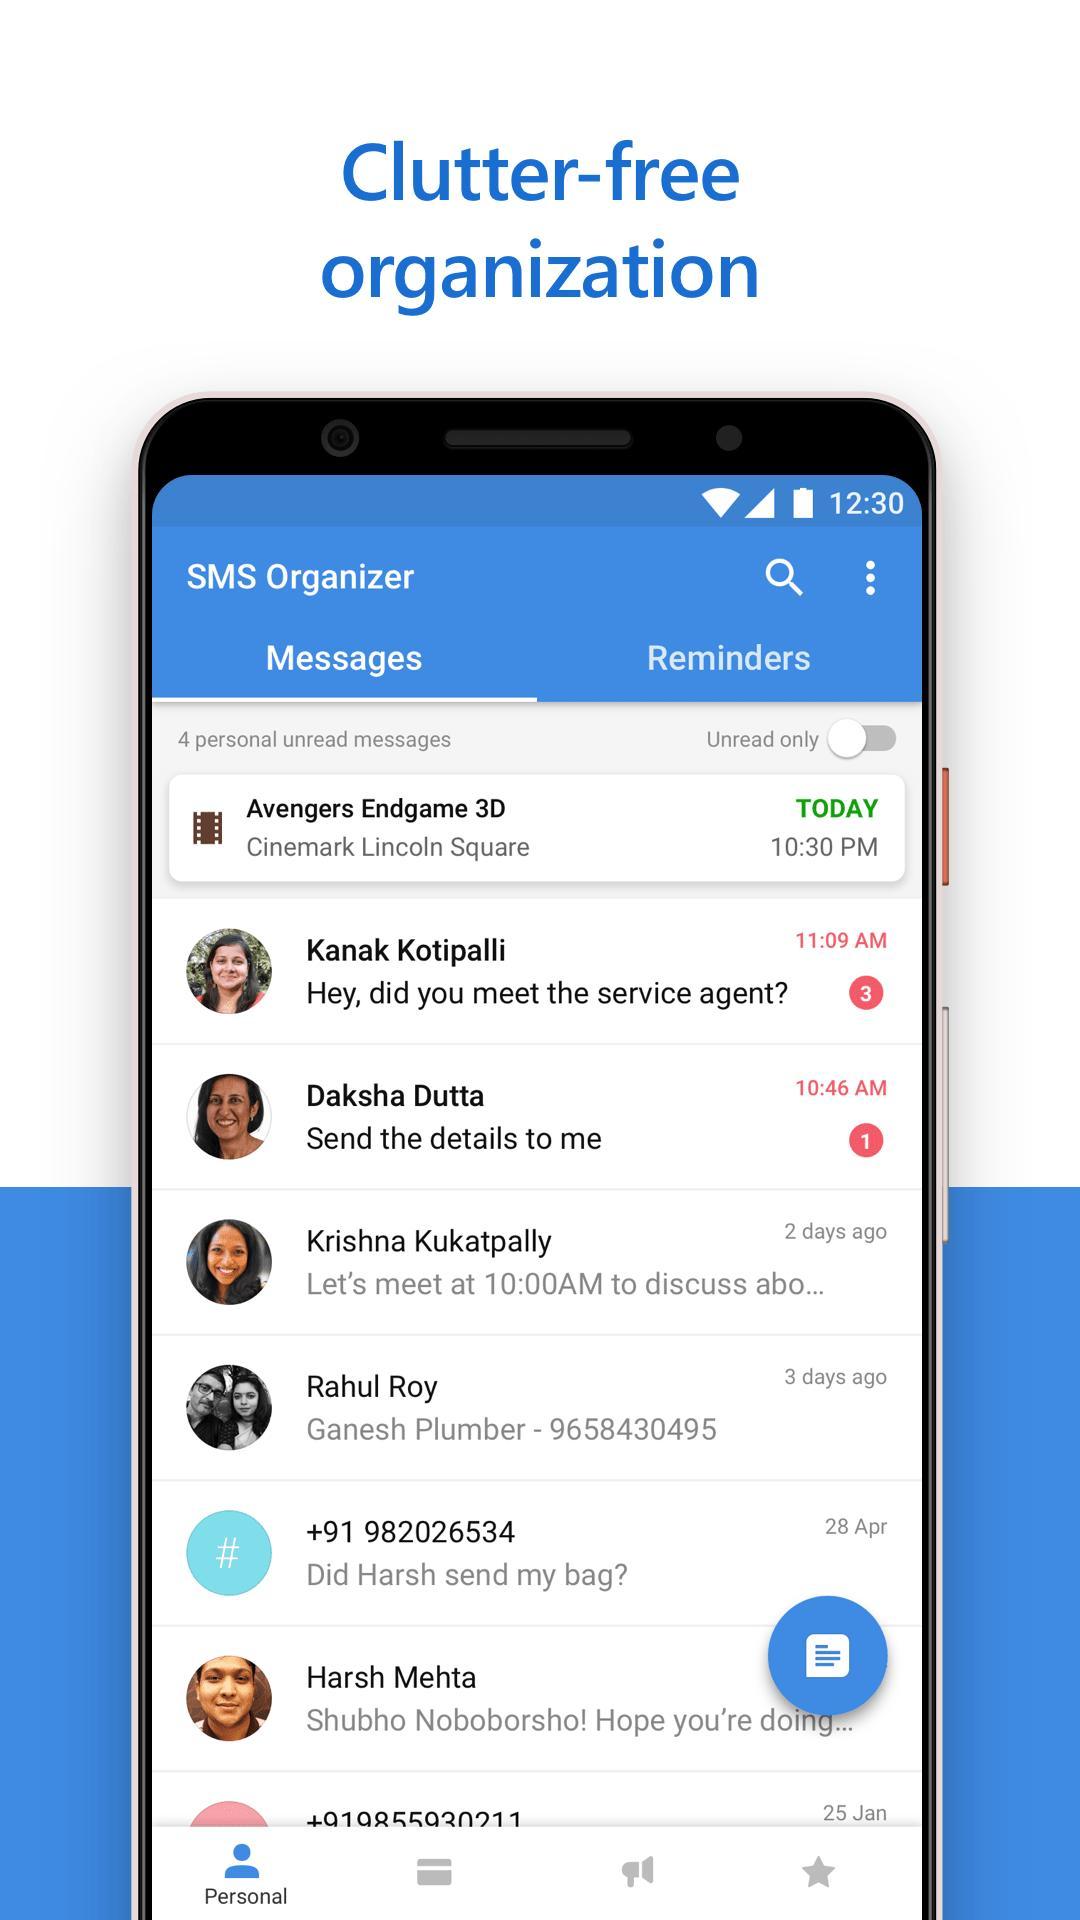 SMS Organizer 1.1.164 Screenshot 1